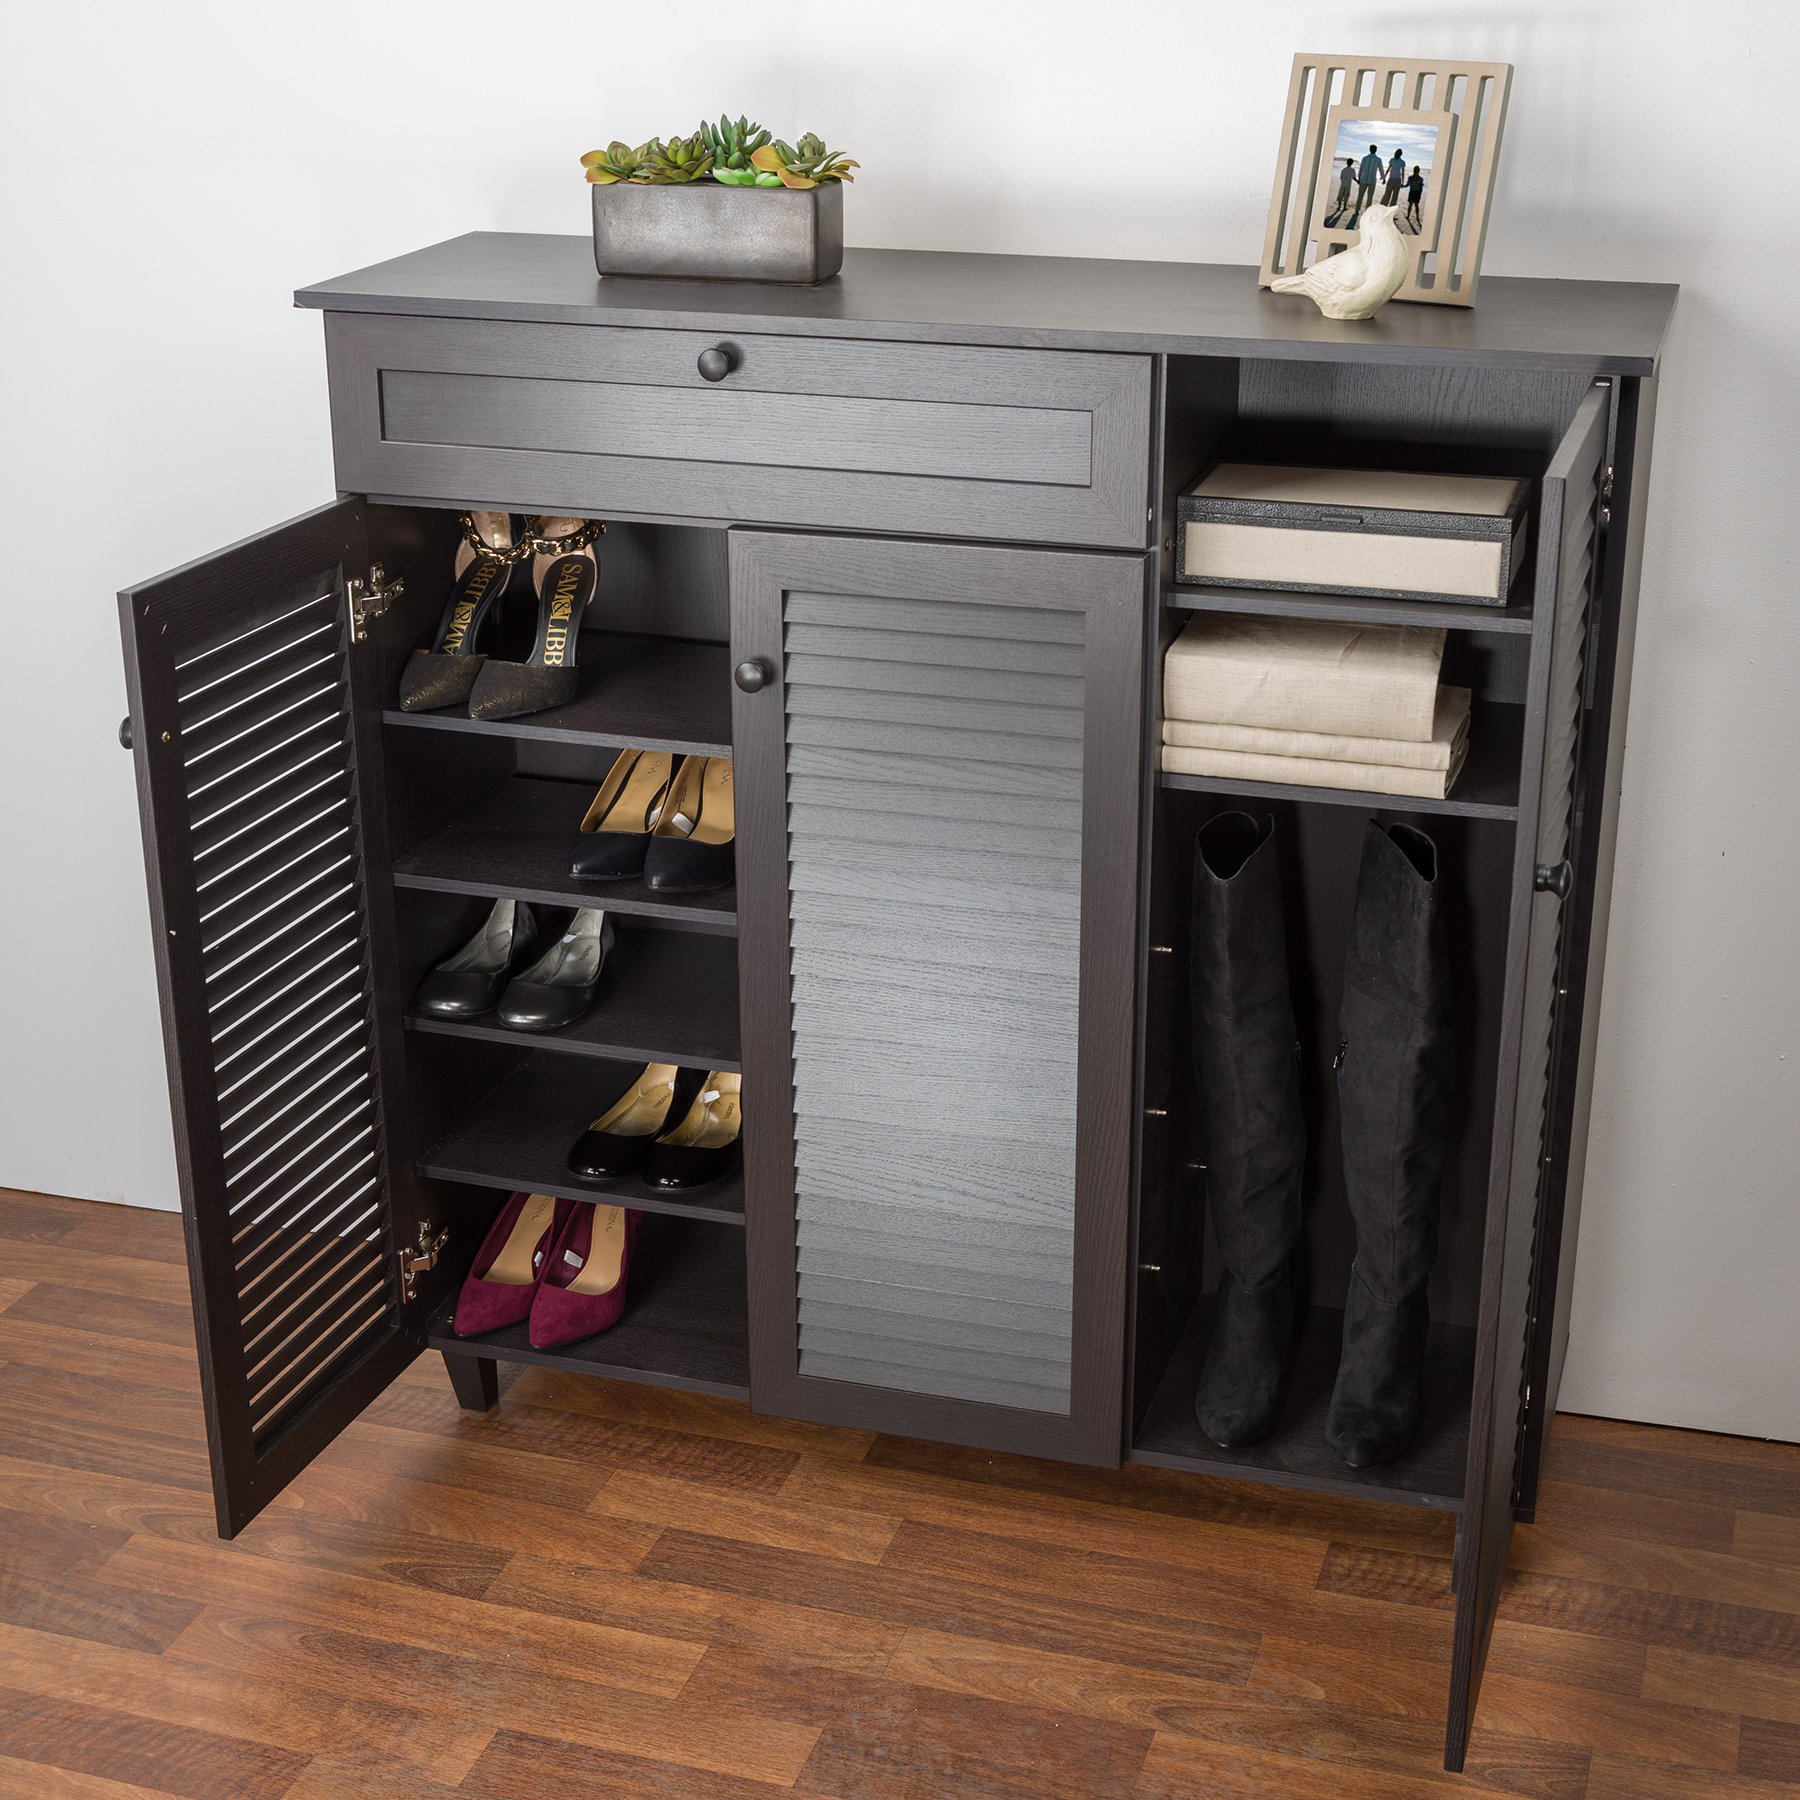 Baxton Studio Pocillo Wood Shoe Storage Cabinet, Brown by Baxton Studio (Image #7)